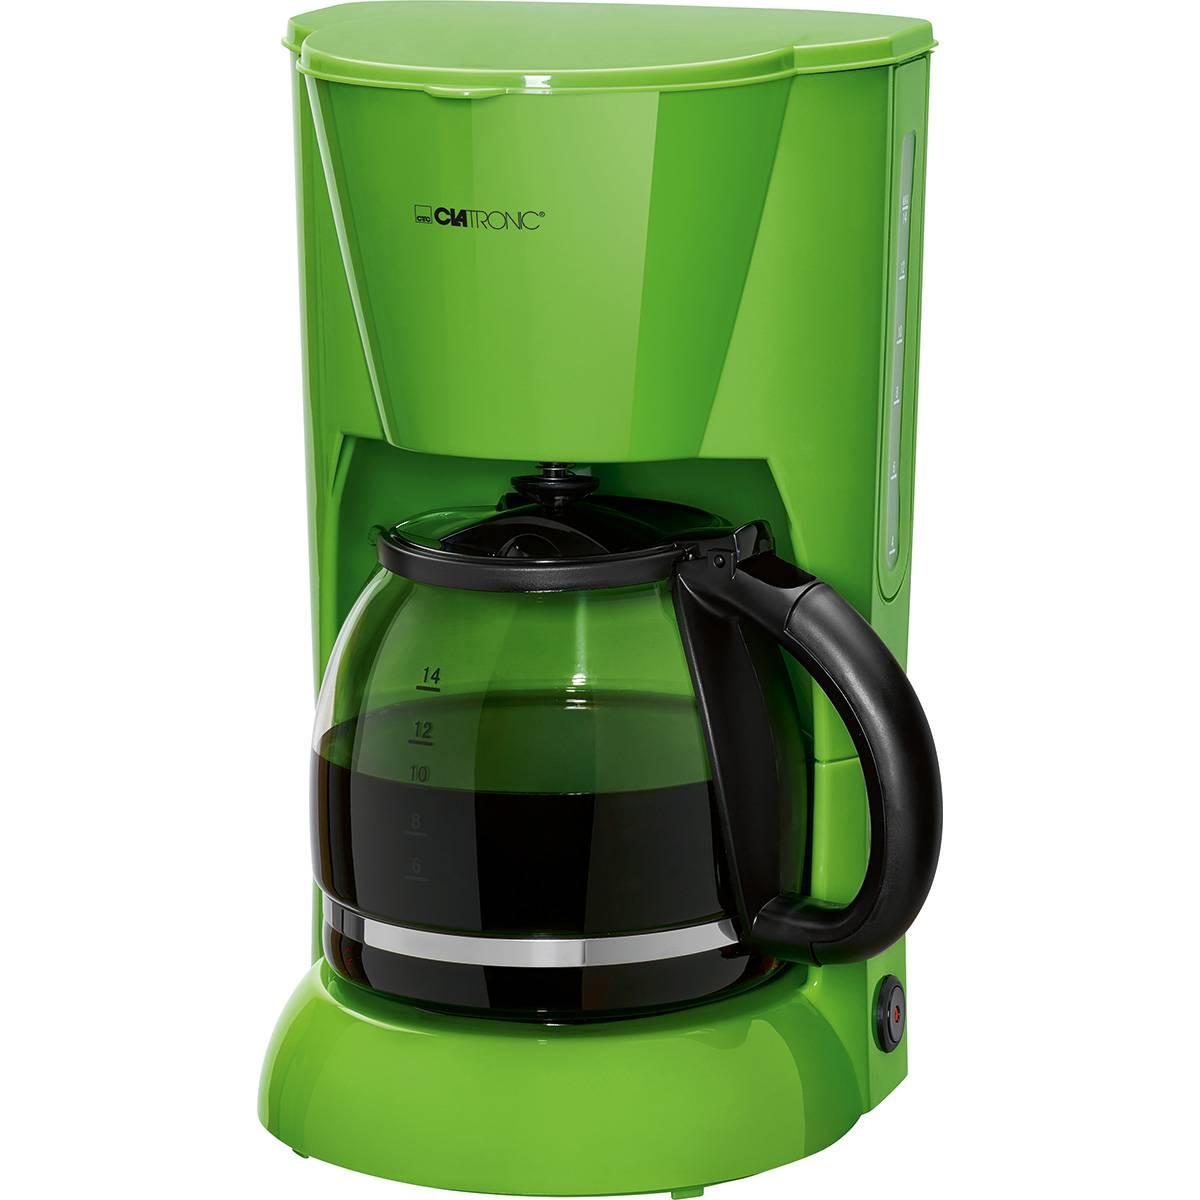 Clatronic KA 3473 - Cafetera de goteo, capacidad de 12 a 14 tazas 1,5 l, 900 W, color verde